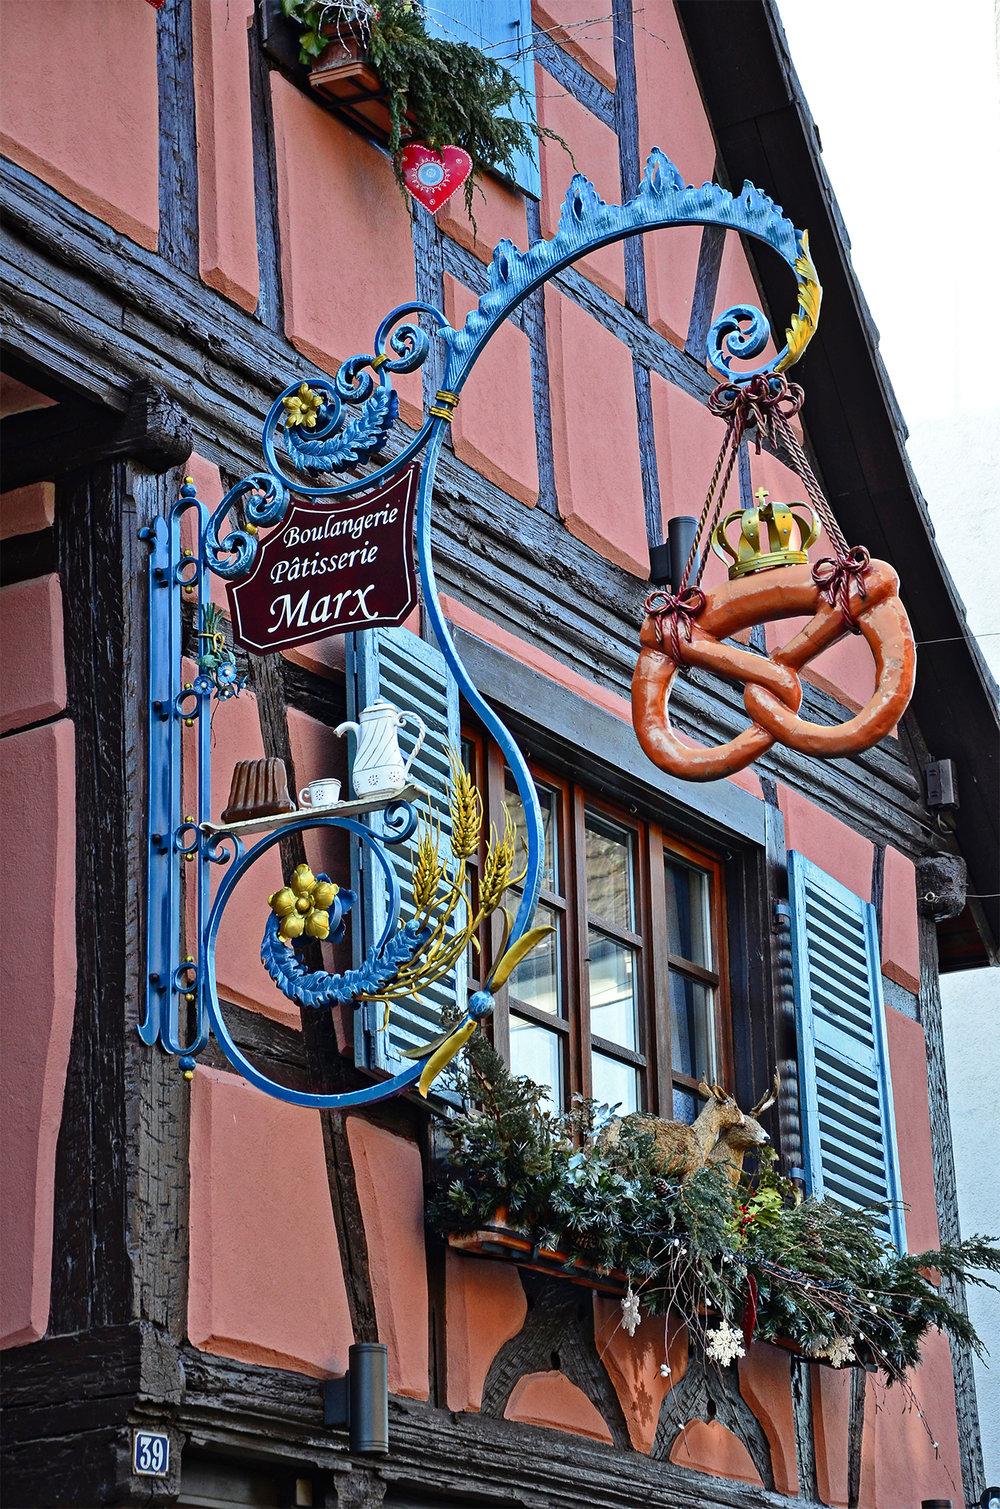 Boulangerie Patisserie Marx